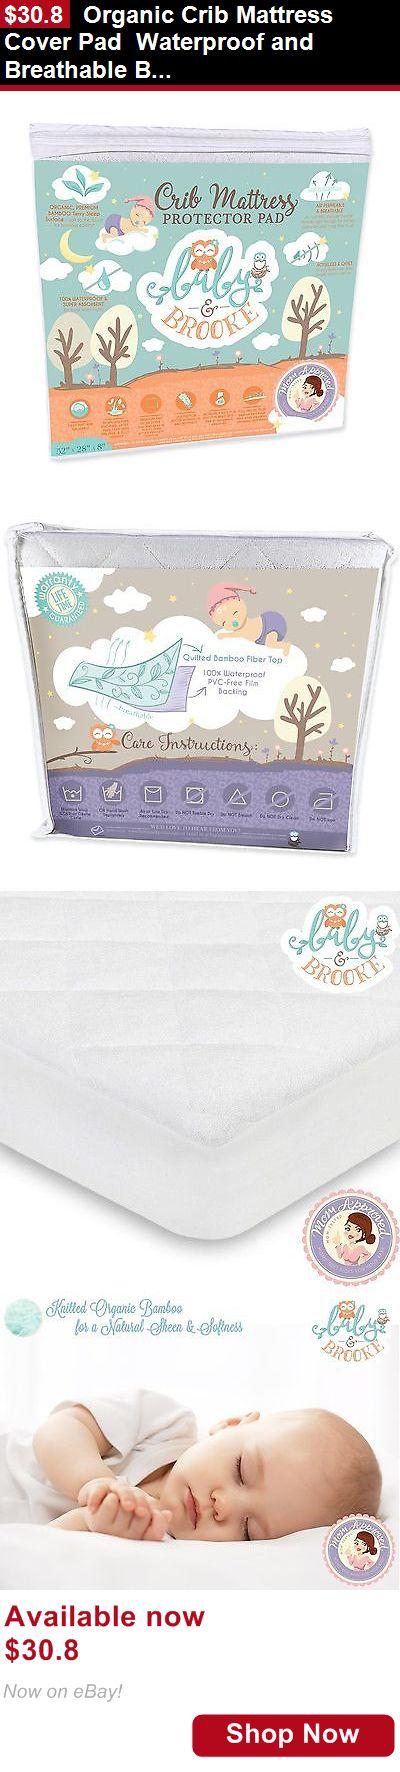 Dream On Me Playard Mattress Mattress Pads And Covers: Organic Crib Mattress Cover Pad Waterproof ...